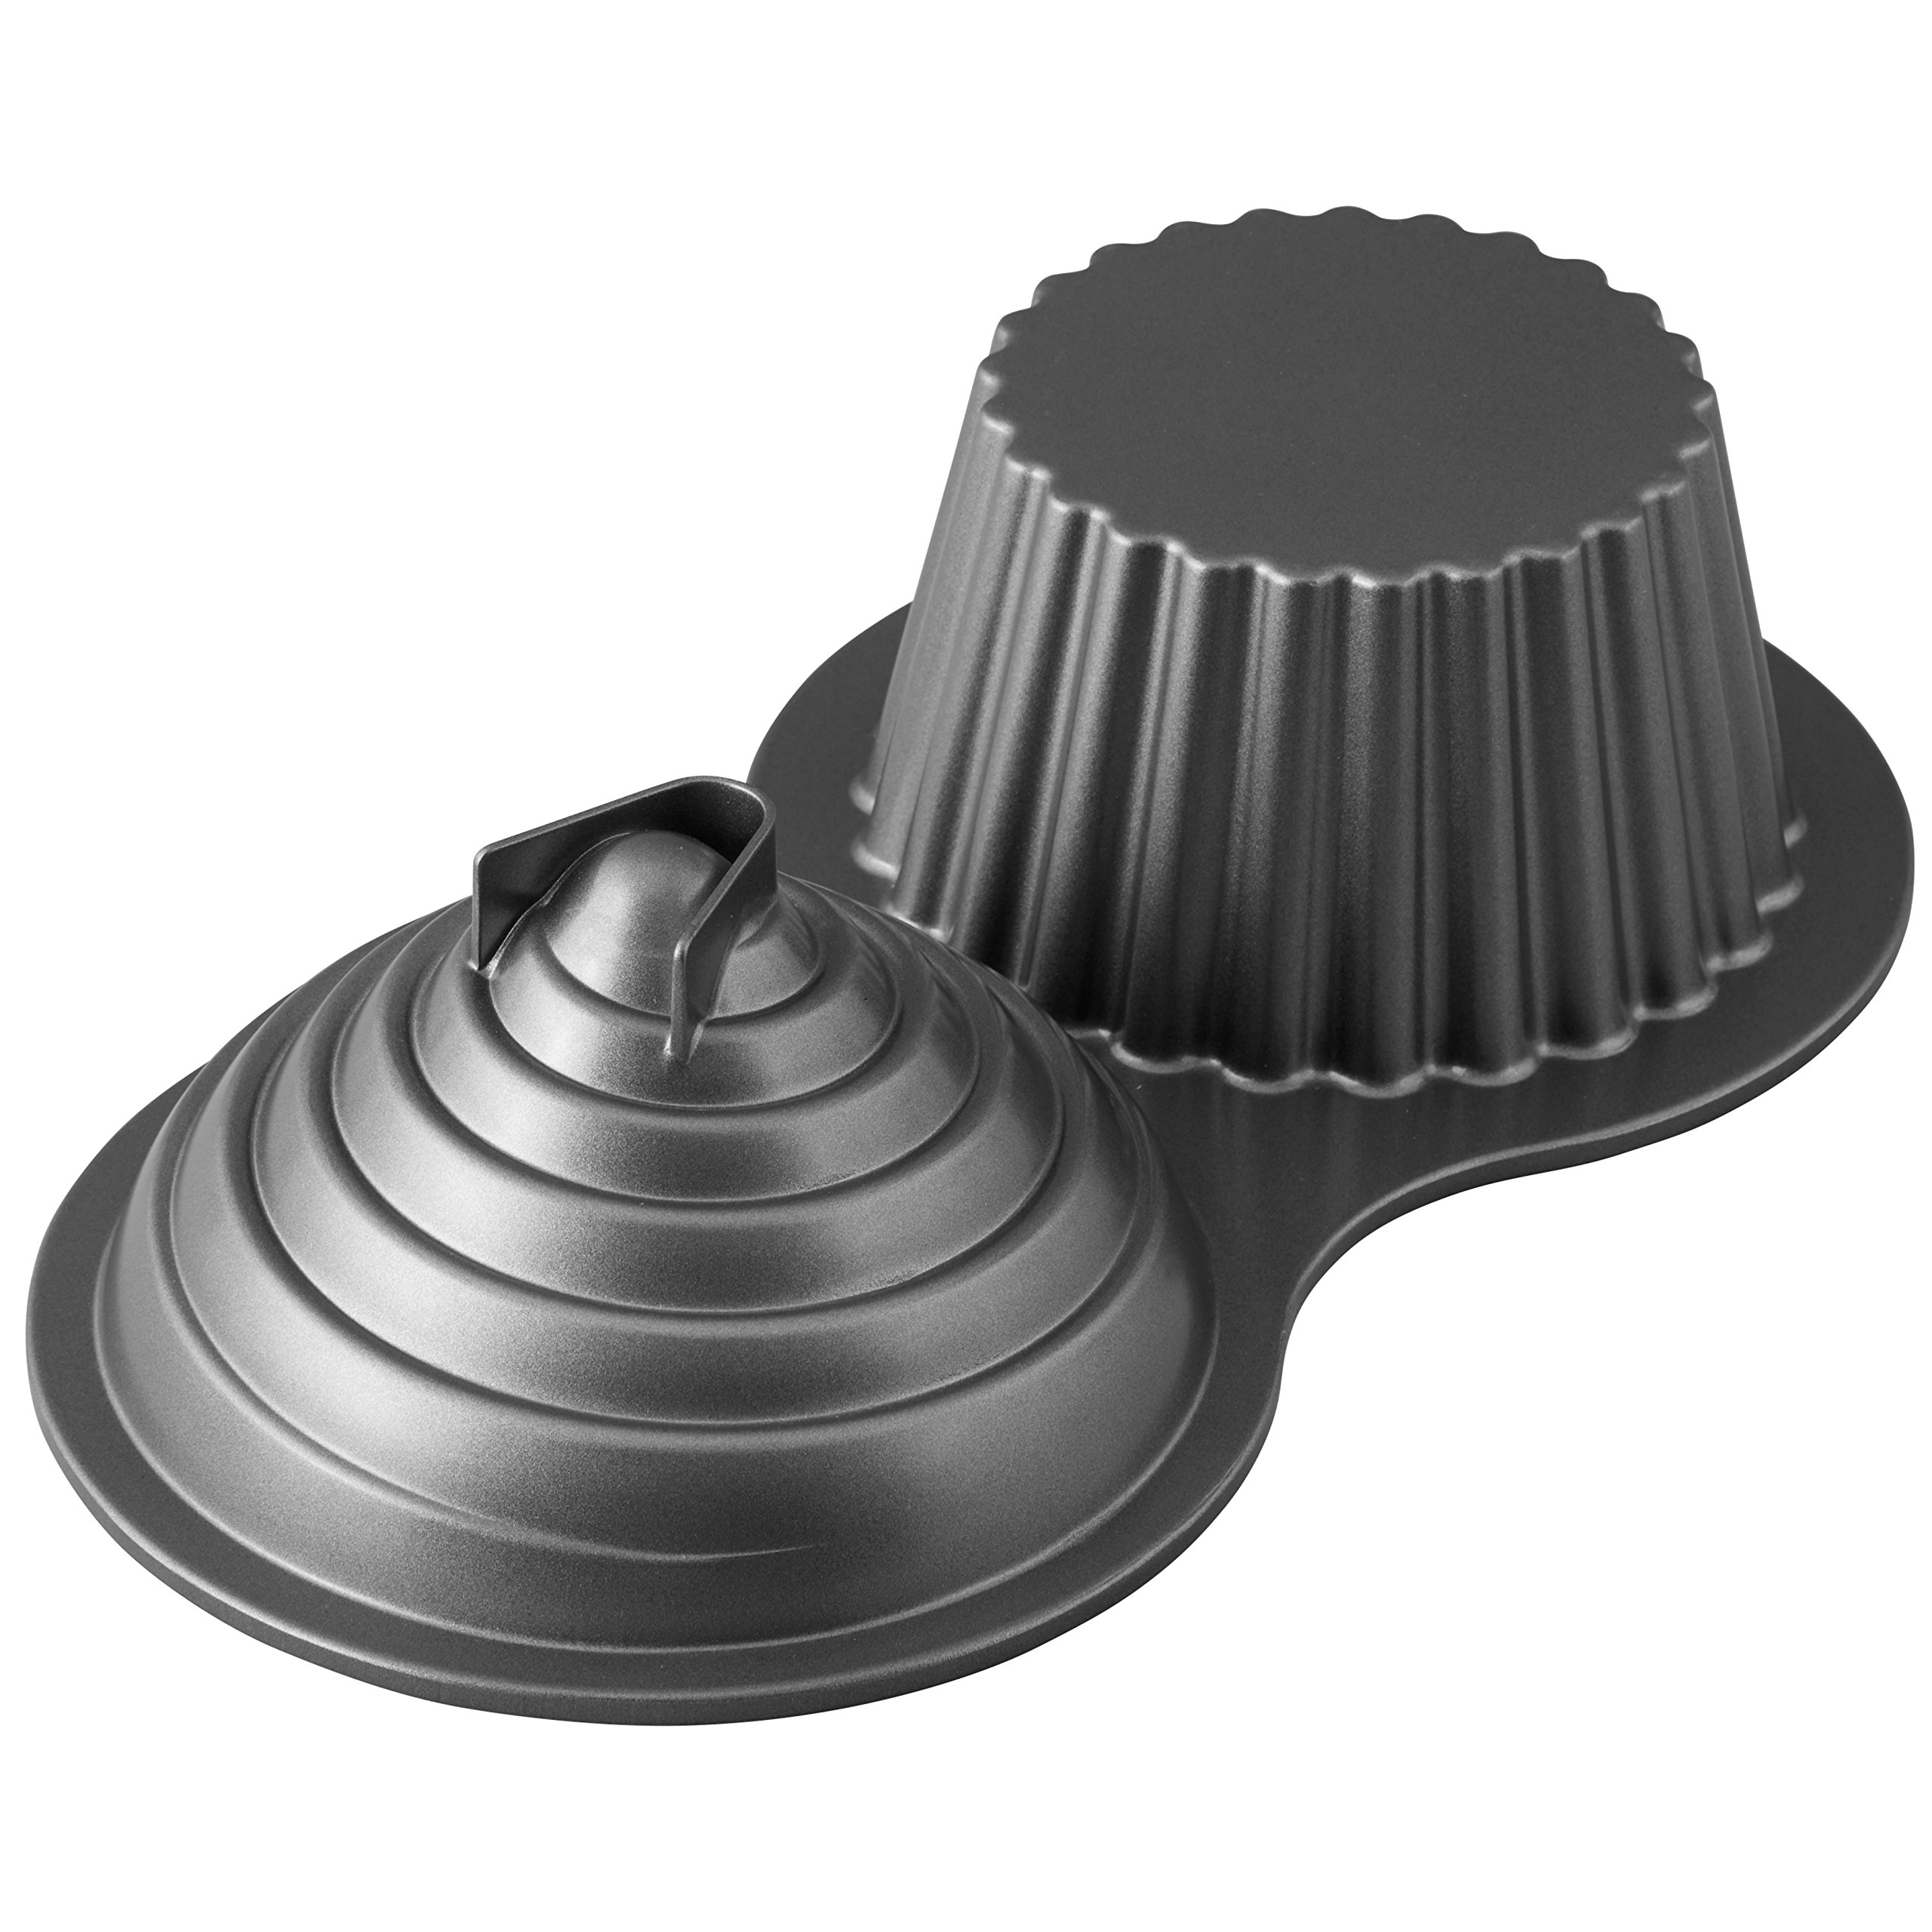 Wilton 2105-5038 Giant DIMENSIONS LARGE CUPCAKE PAN, by Wilton